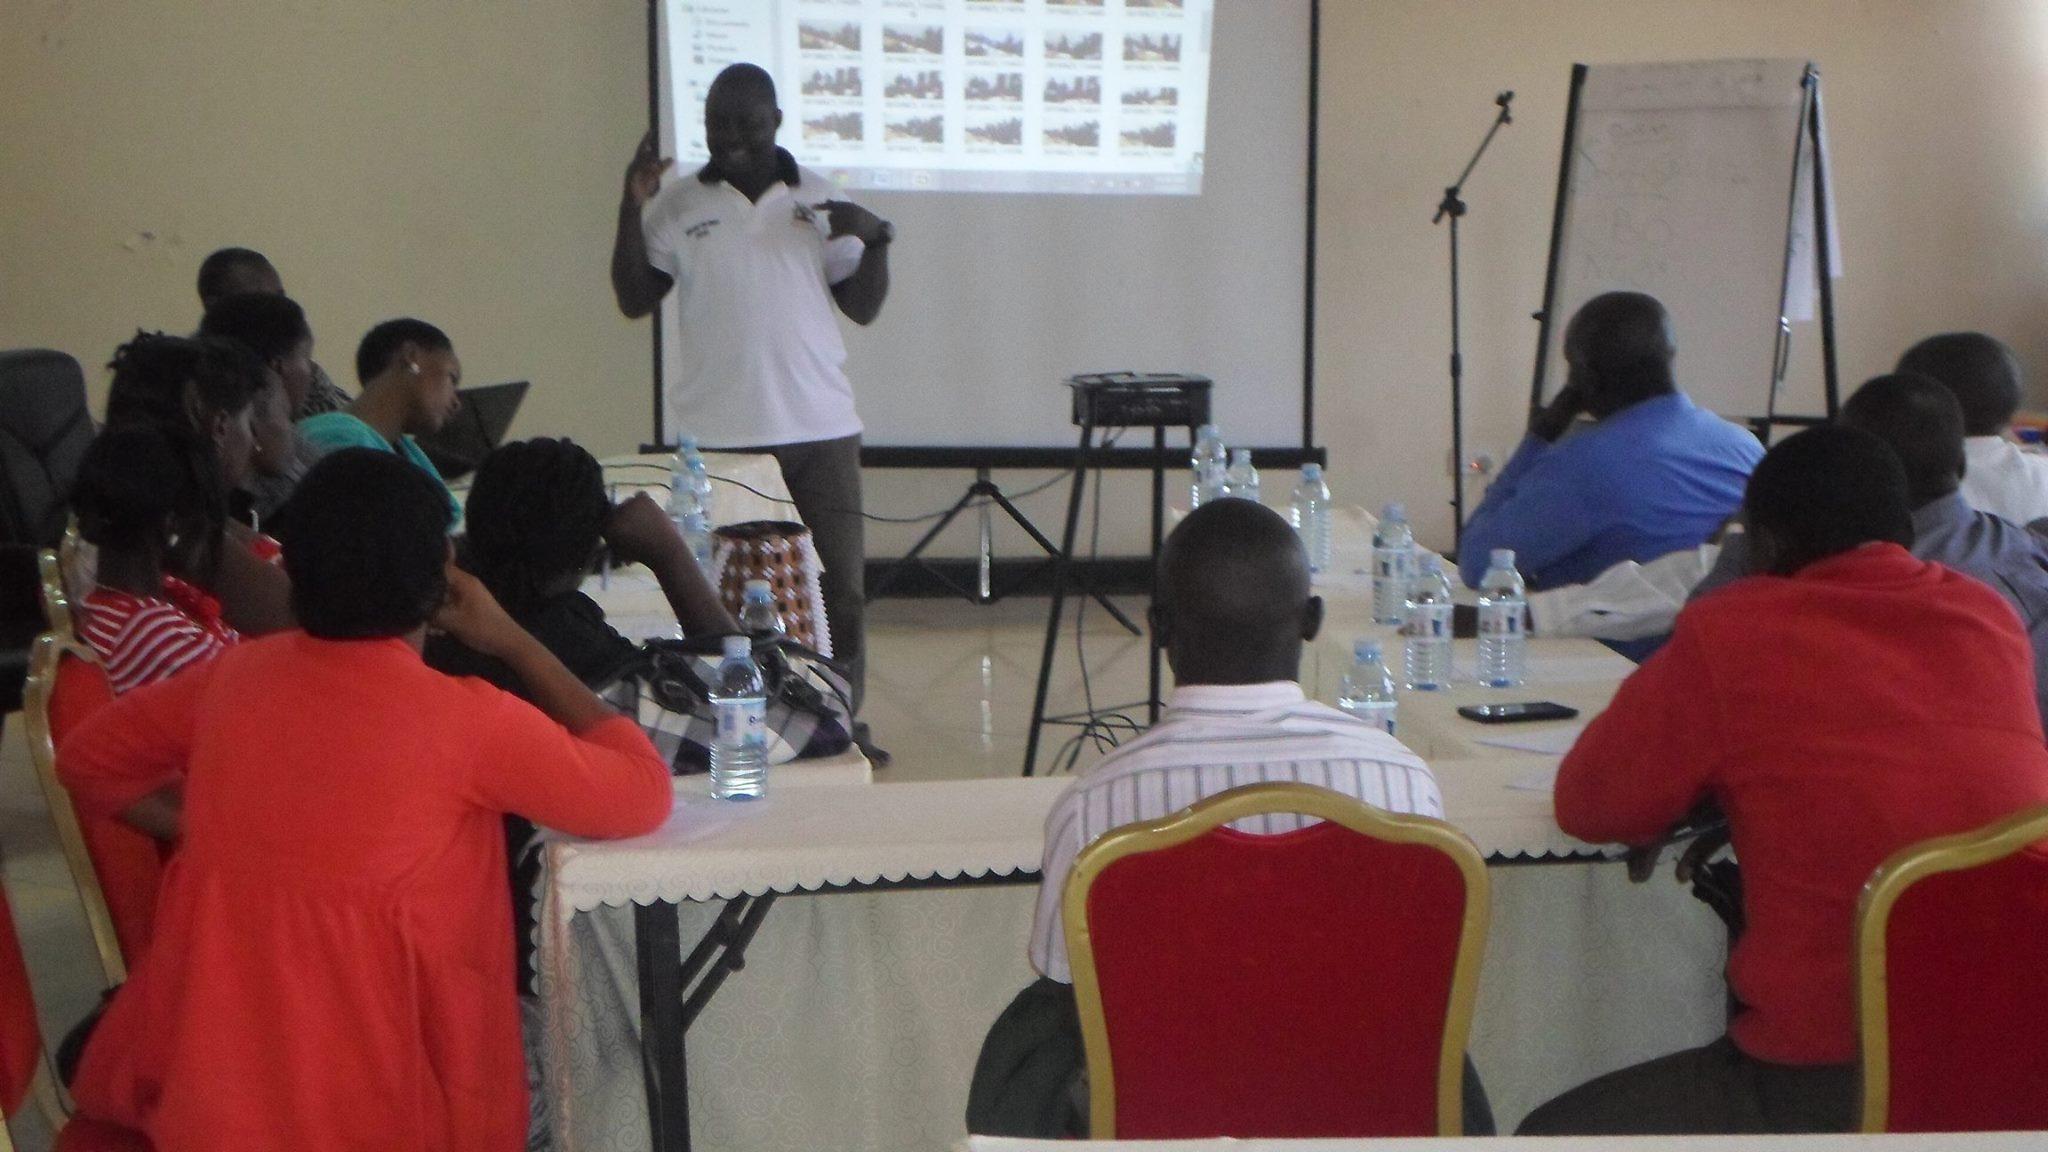 Kiko Kivumbi addresses meeting of key affected populations in Hoima. (Photo courtesy of Kiko Kivumbi)